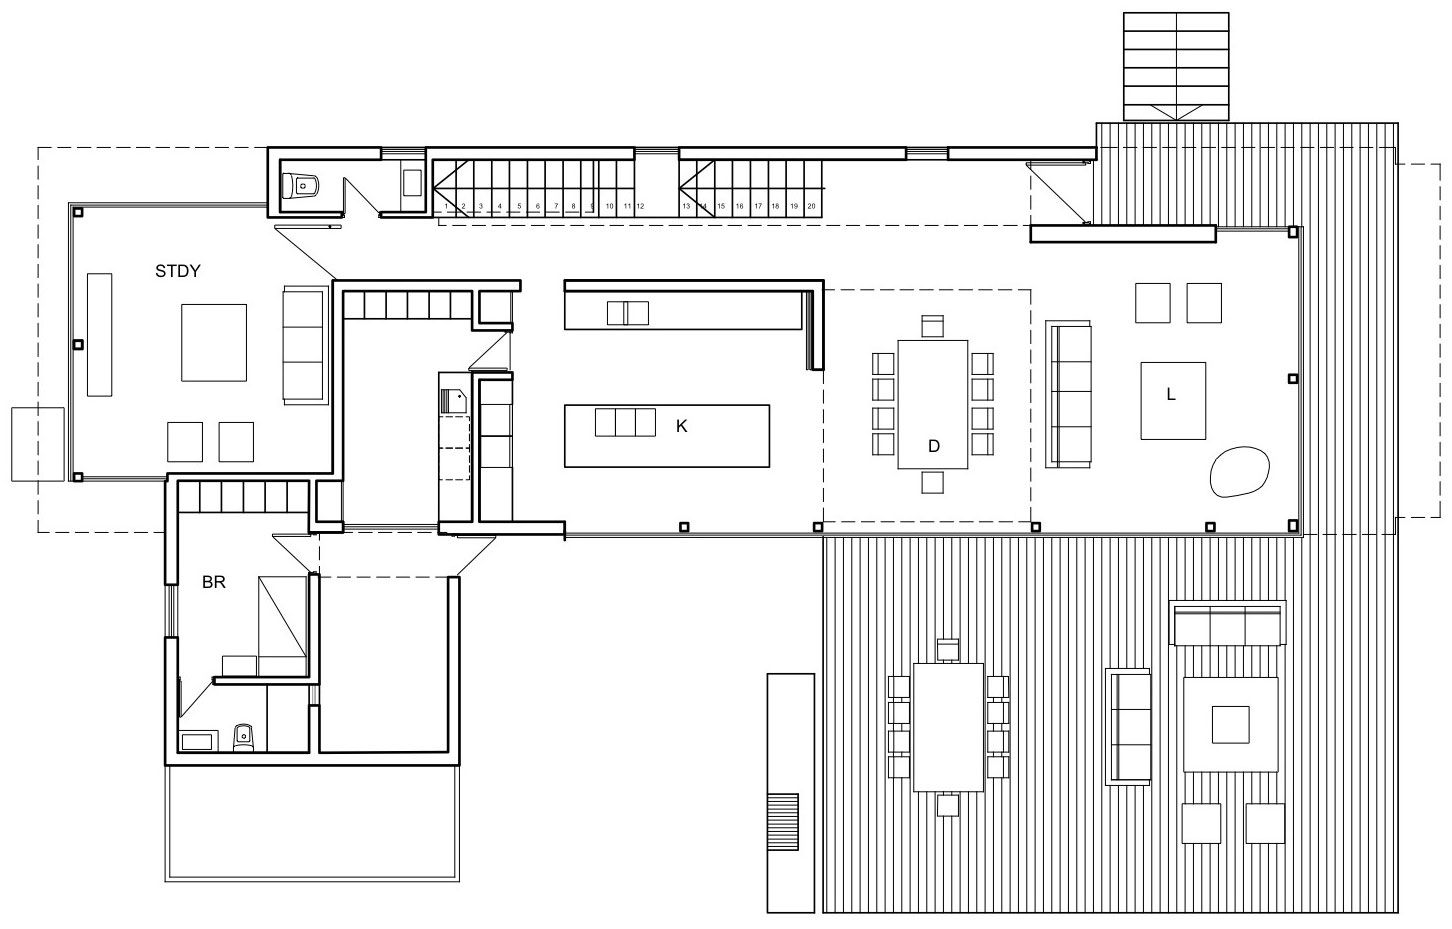 Casa Cantagua By Raimundo Anguita 11 Floor Plans Architectural House Plans How To Plan